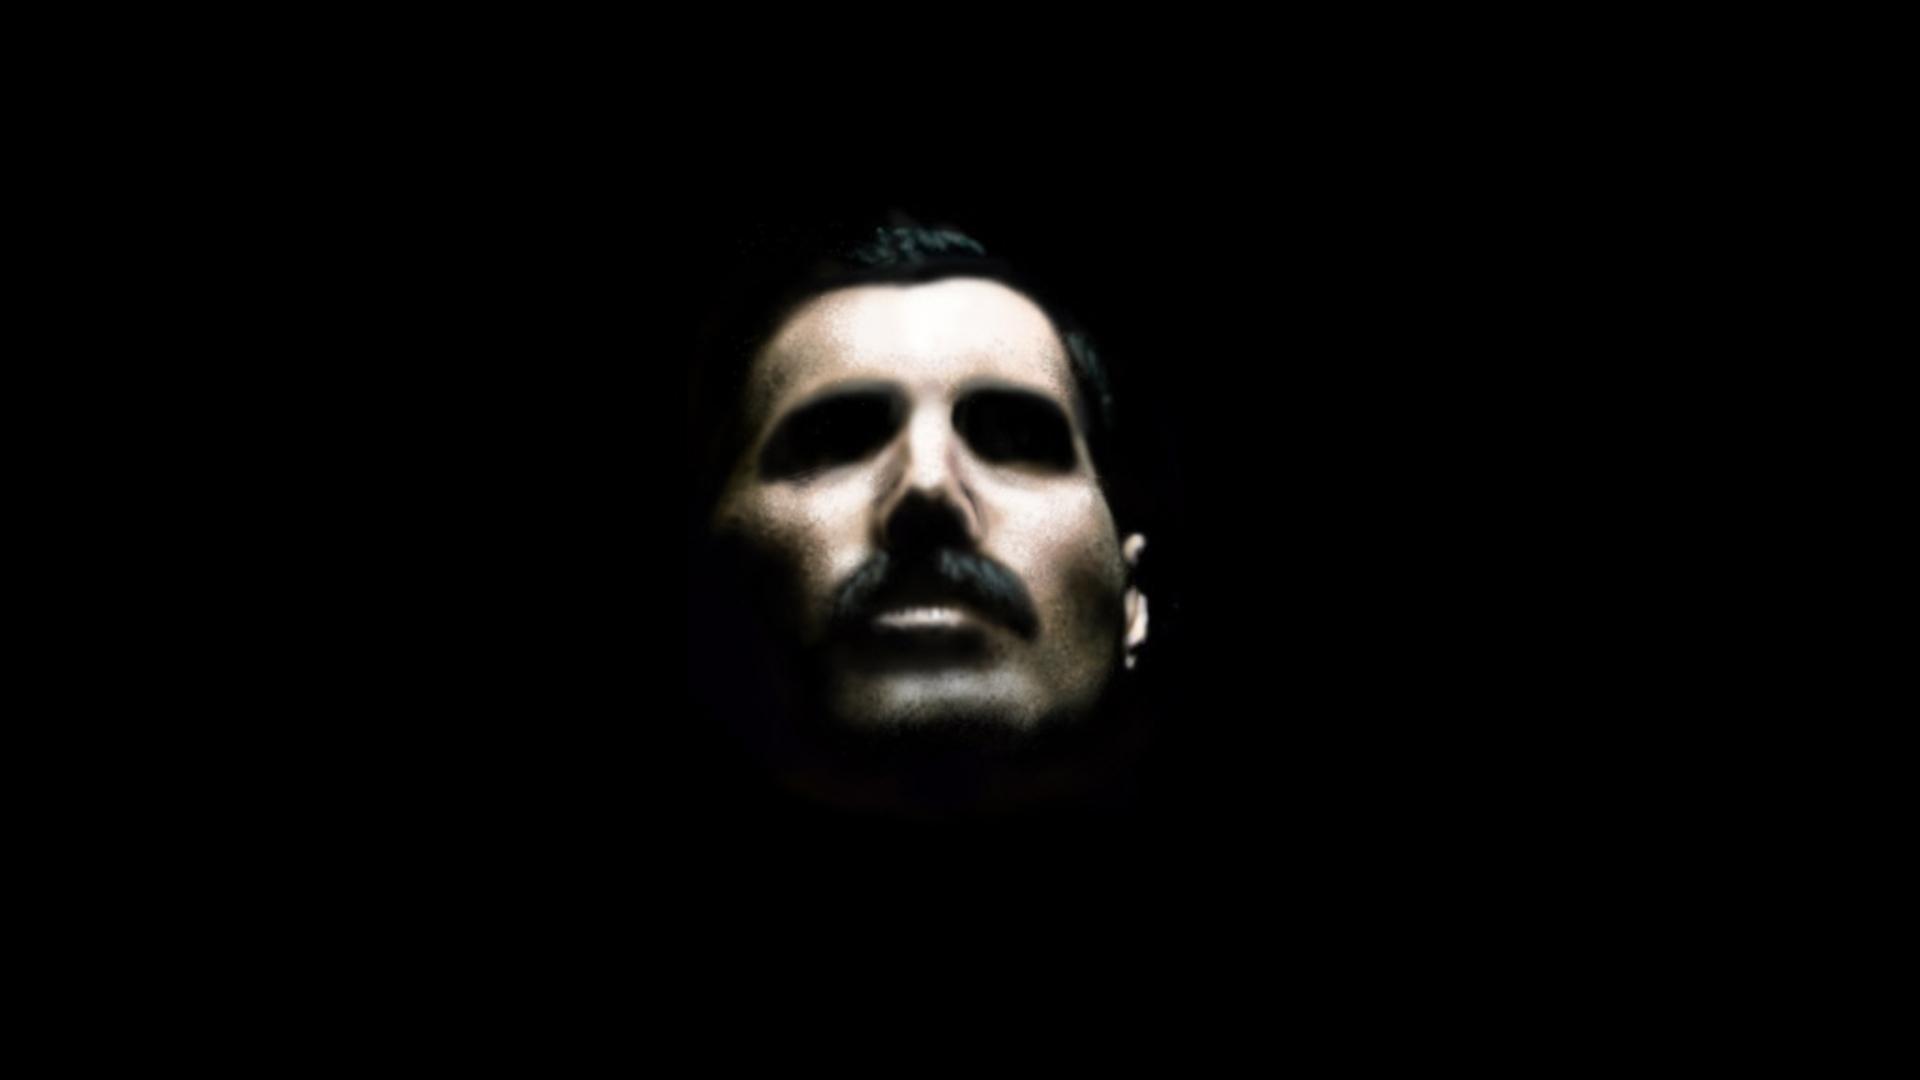 Freddie Mercury 16 Cool Hd Wallpaper